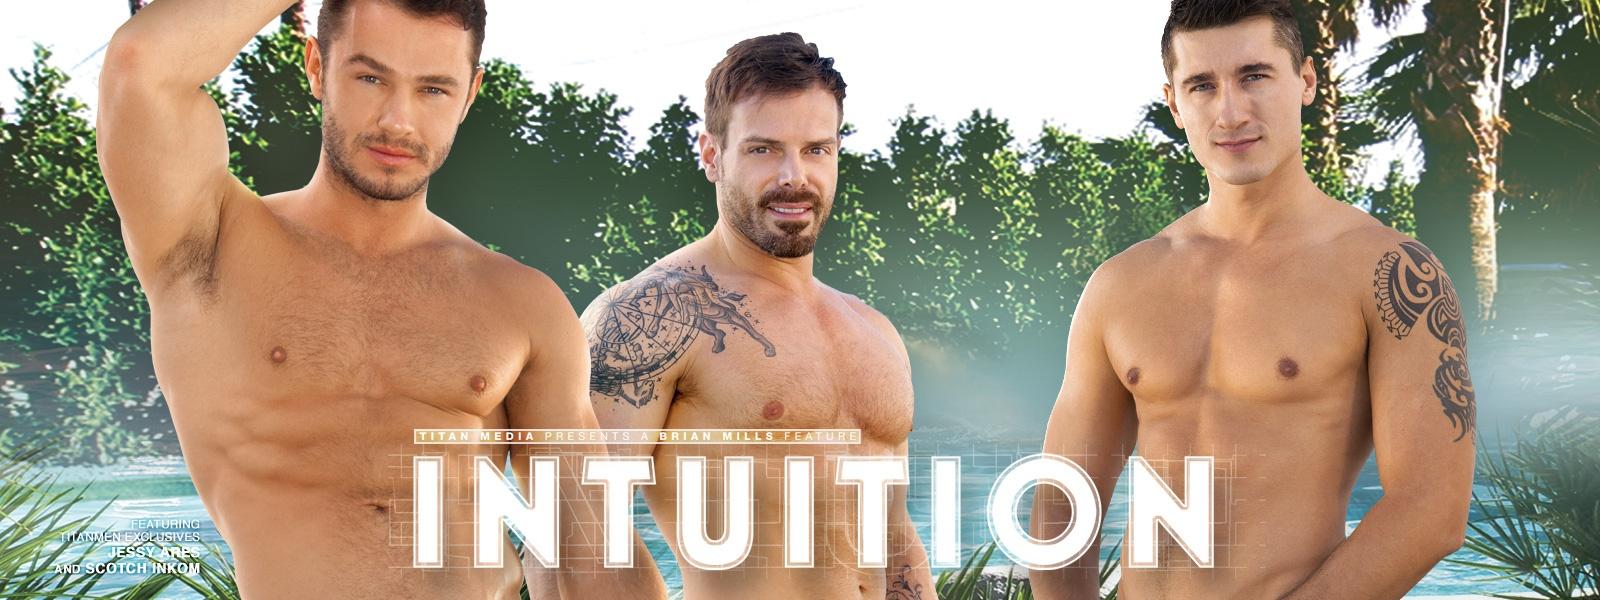 TitanMen Intuition